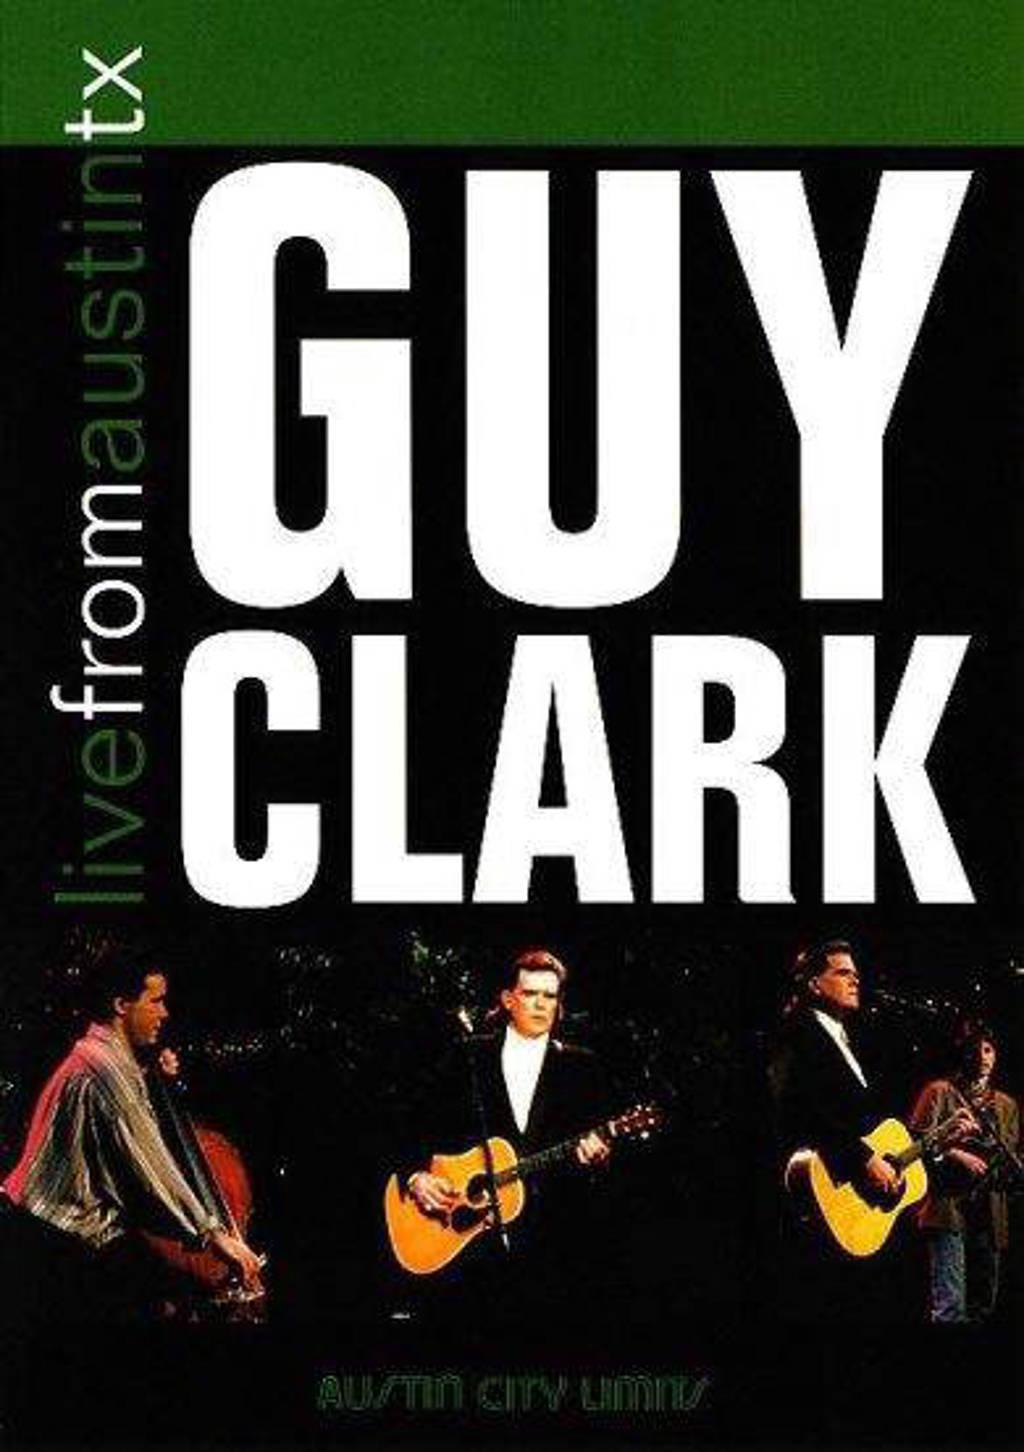 Guy Clark - Live from Austin Texas (DVD)